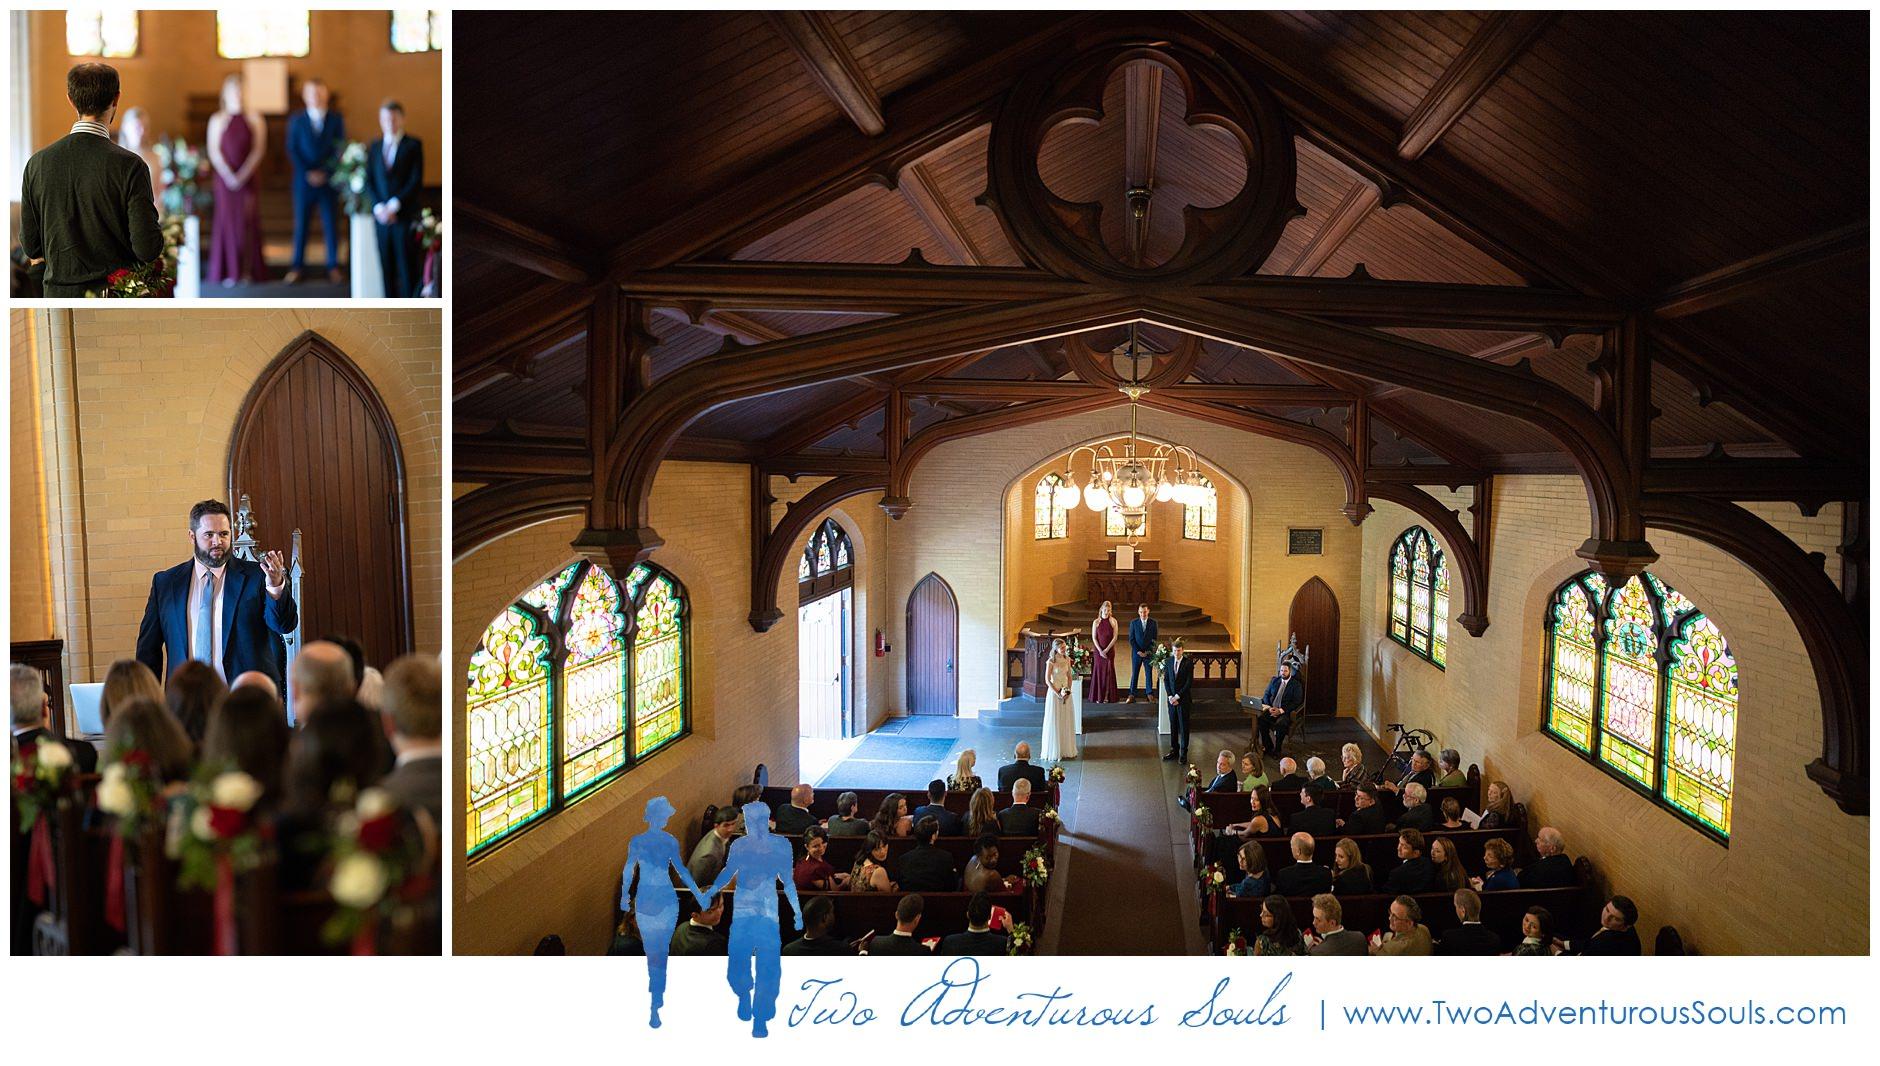 Grace Maine Photographers, Portland Maine Wedding Photographers, Two Adventurous Souls- 090719_0019.jpg